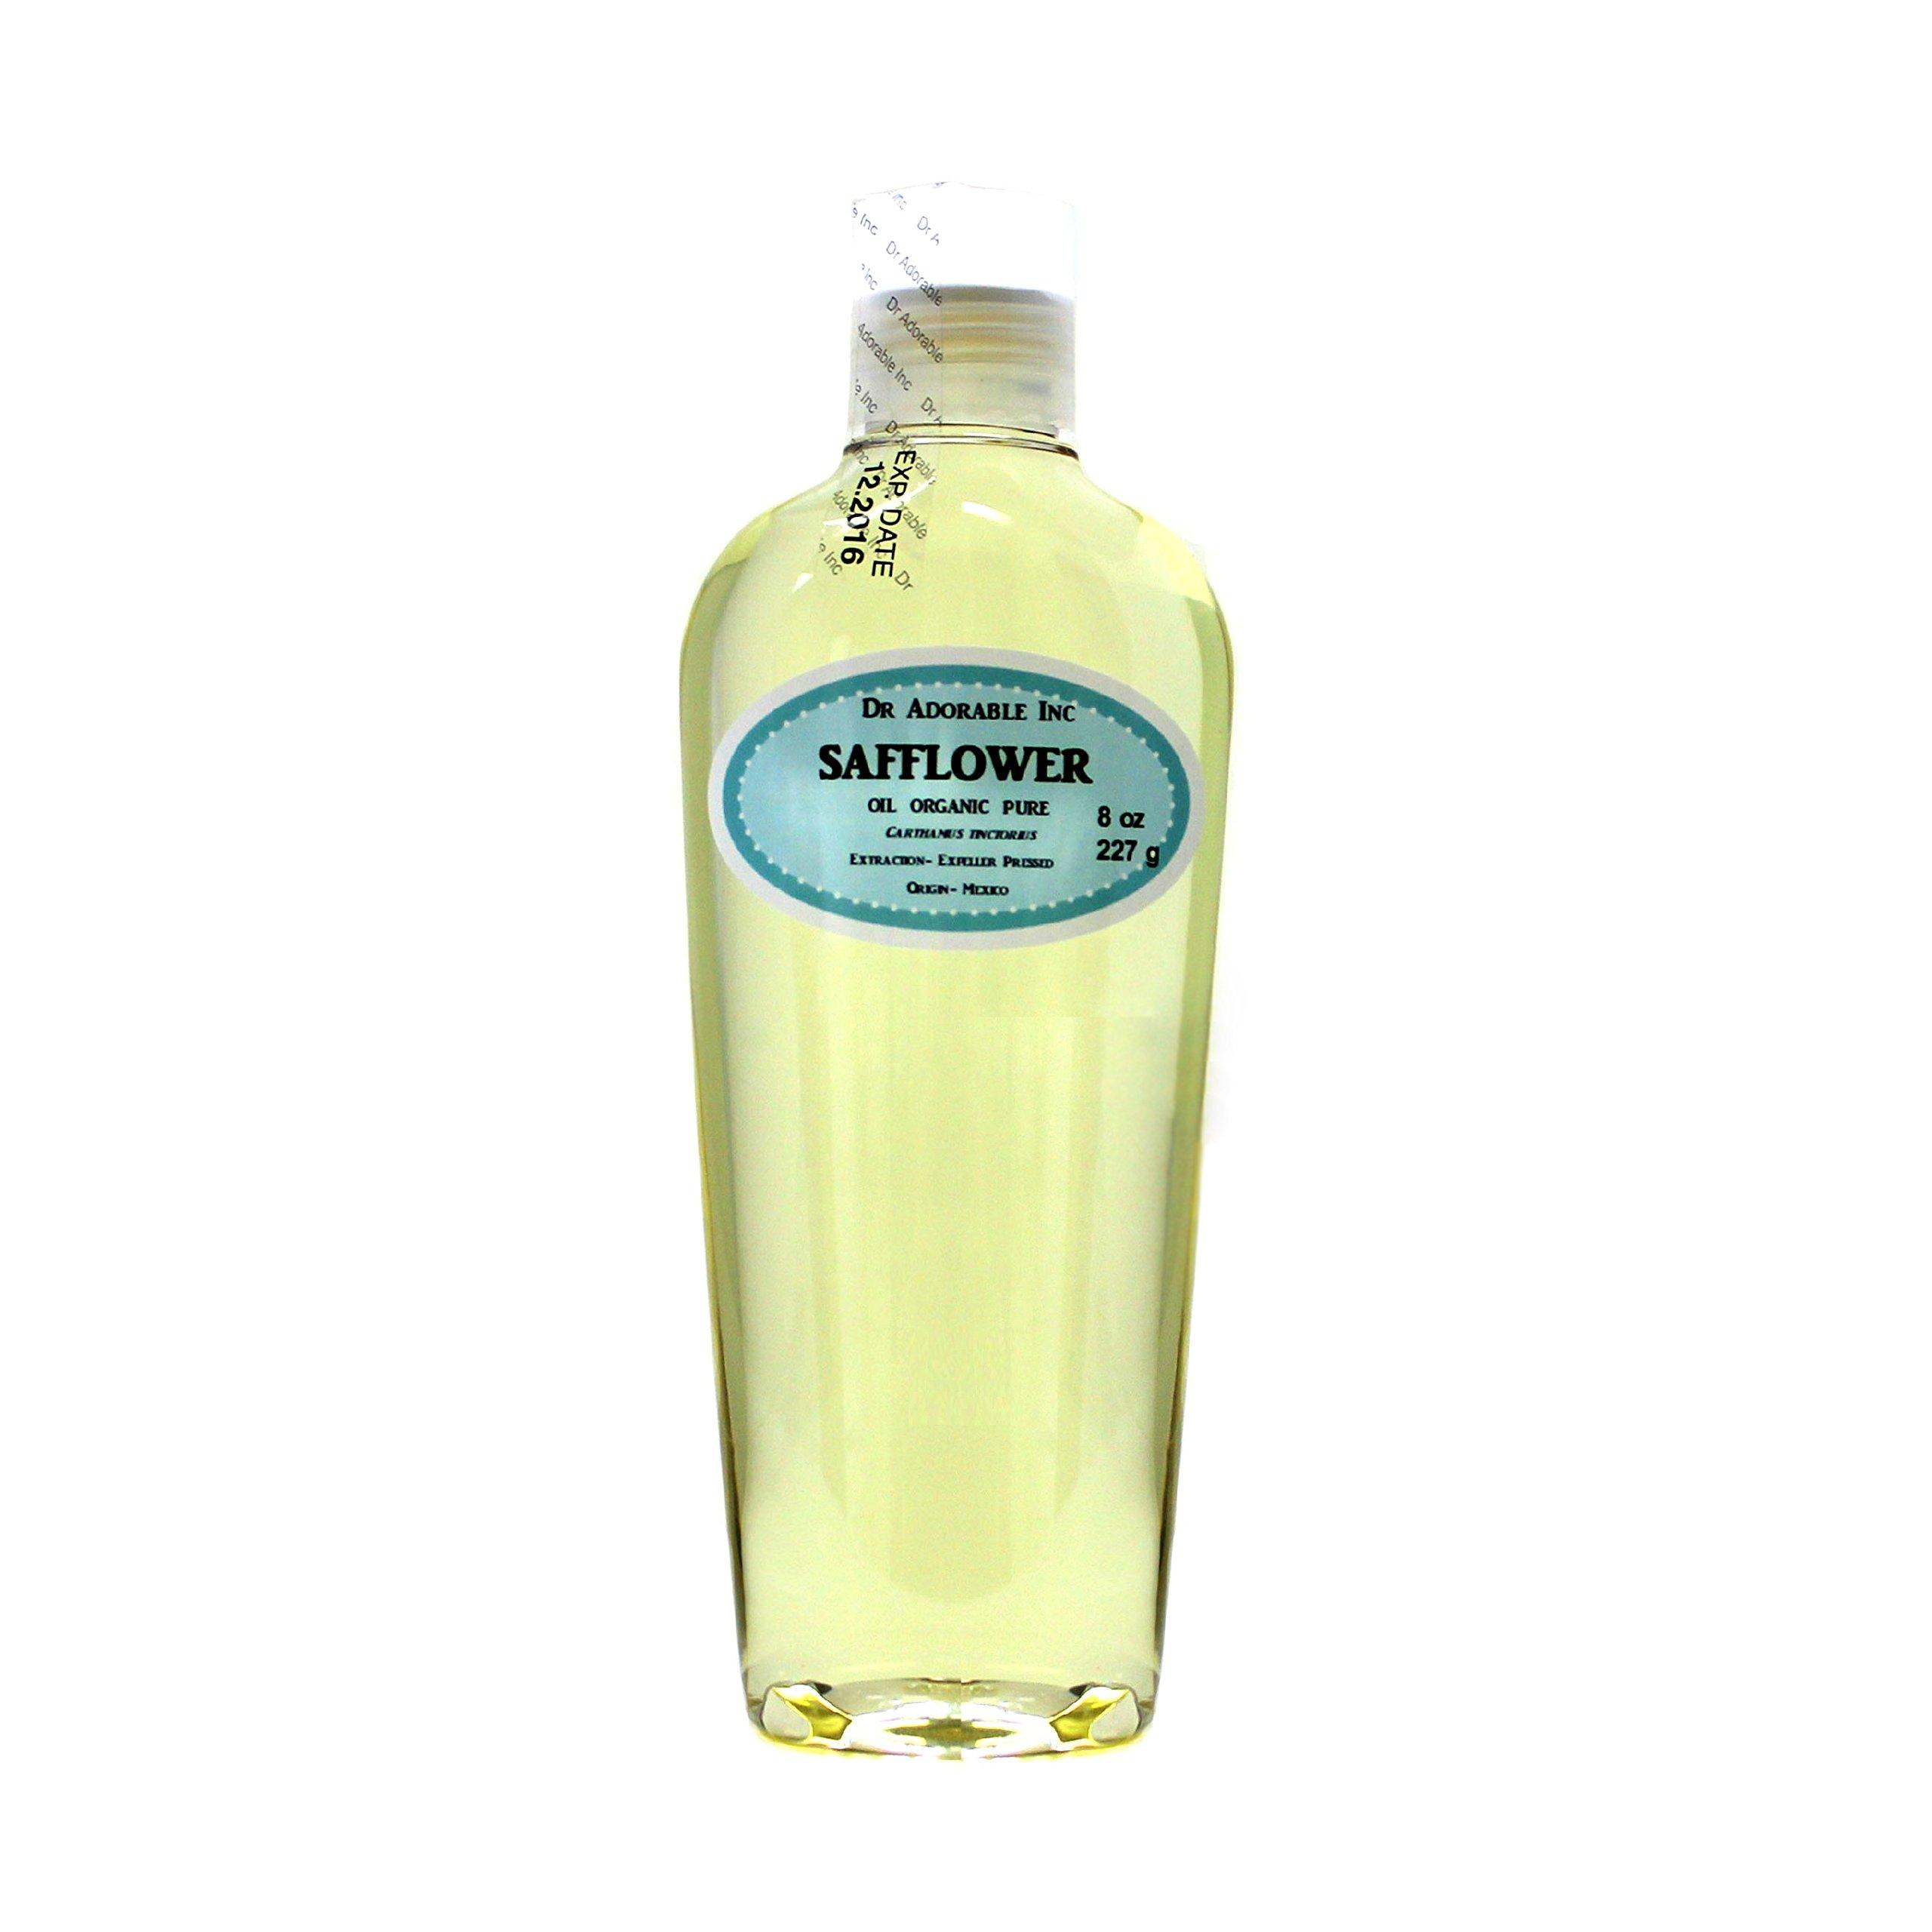 Safflower Oil High Oleic 100% Pure Organic 8 Oz